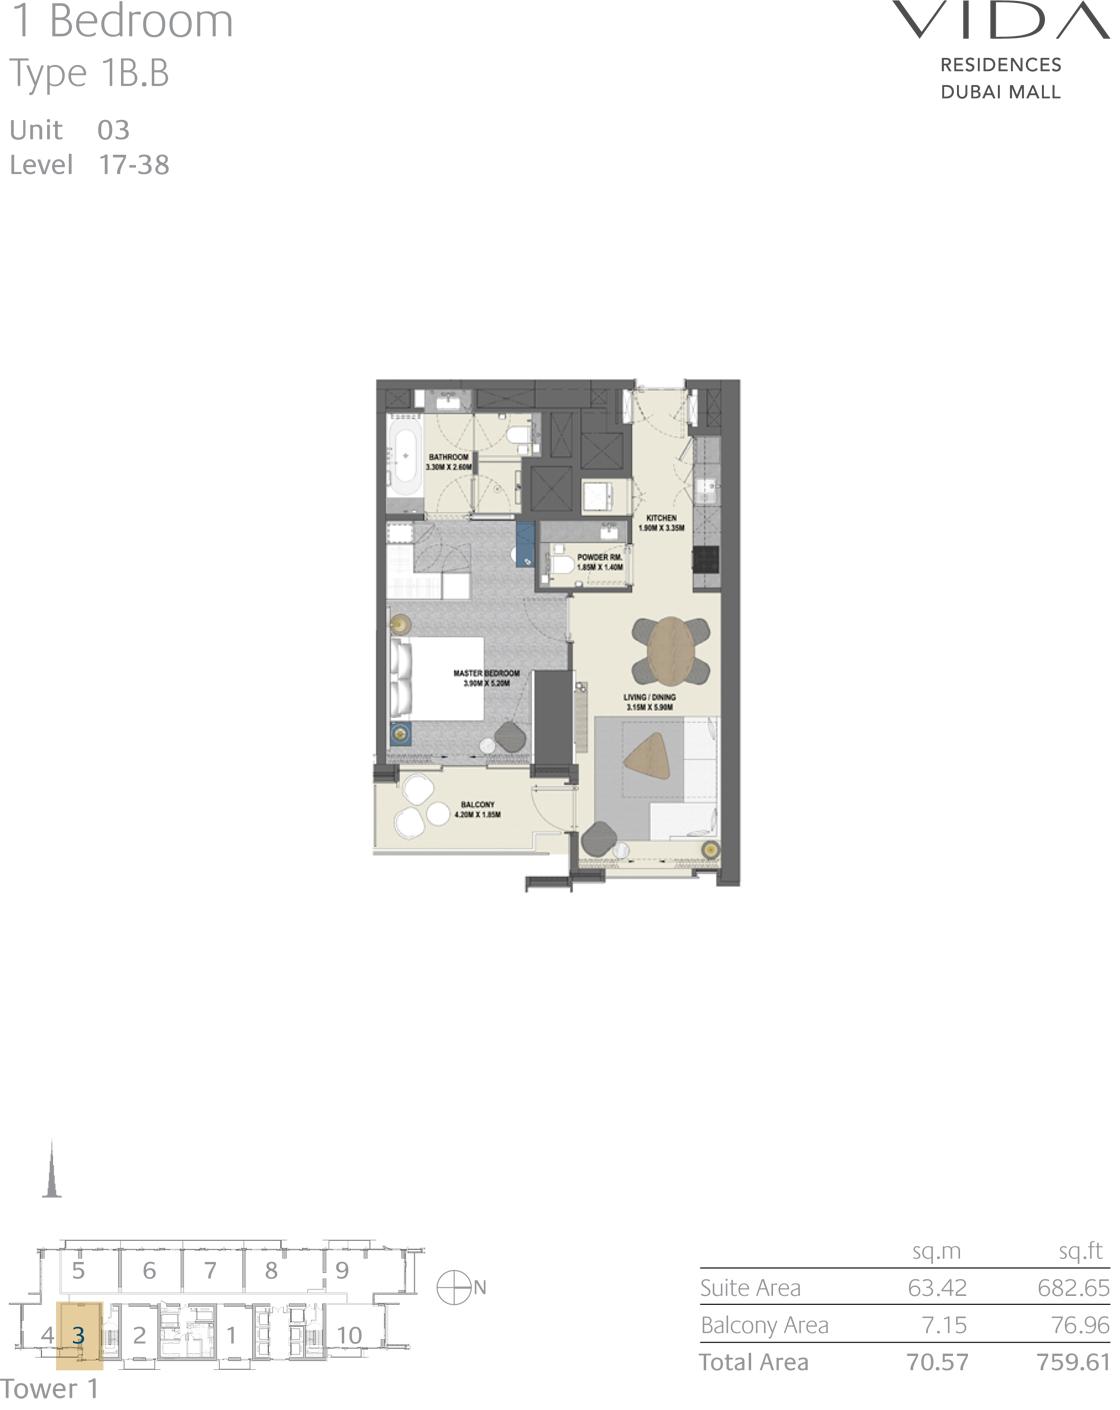 1 Bedroom Type 1B.B Unit 03 Level 17-38